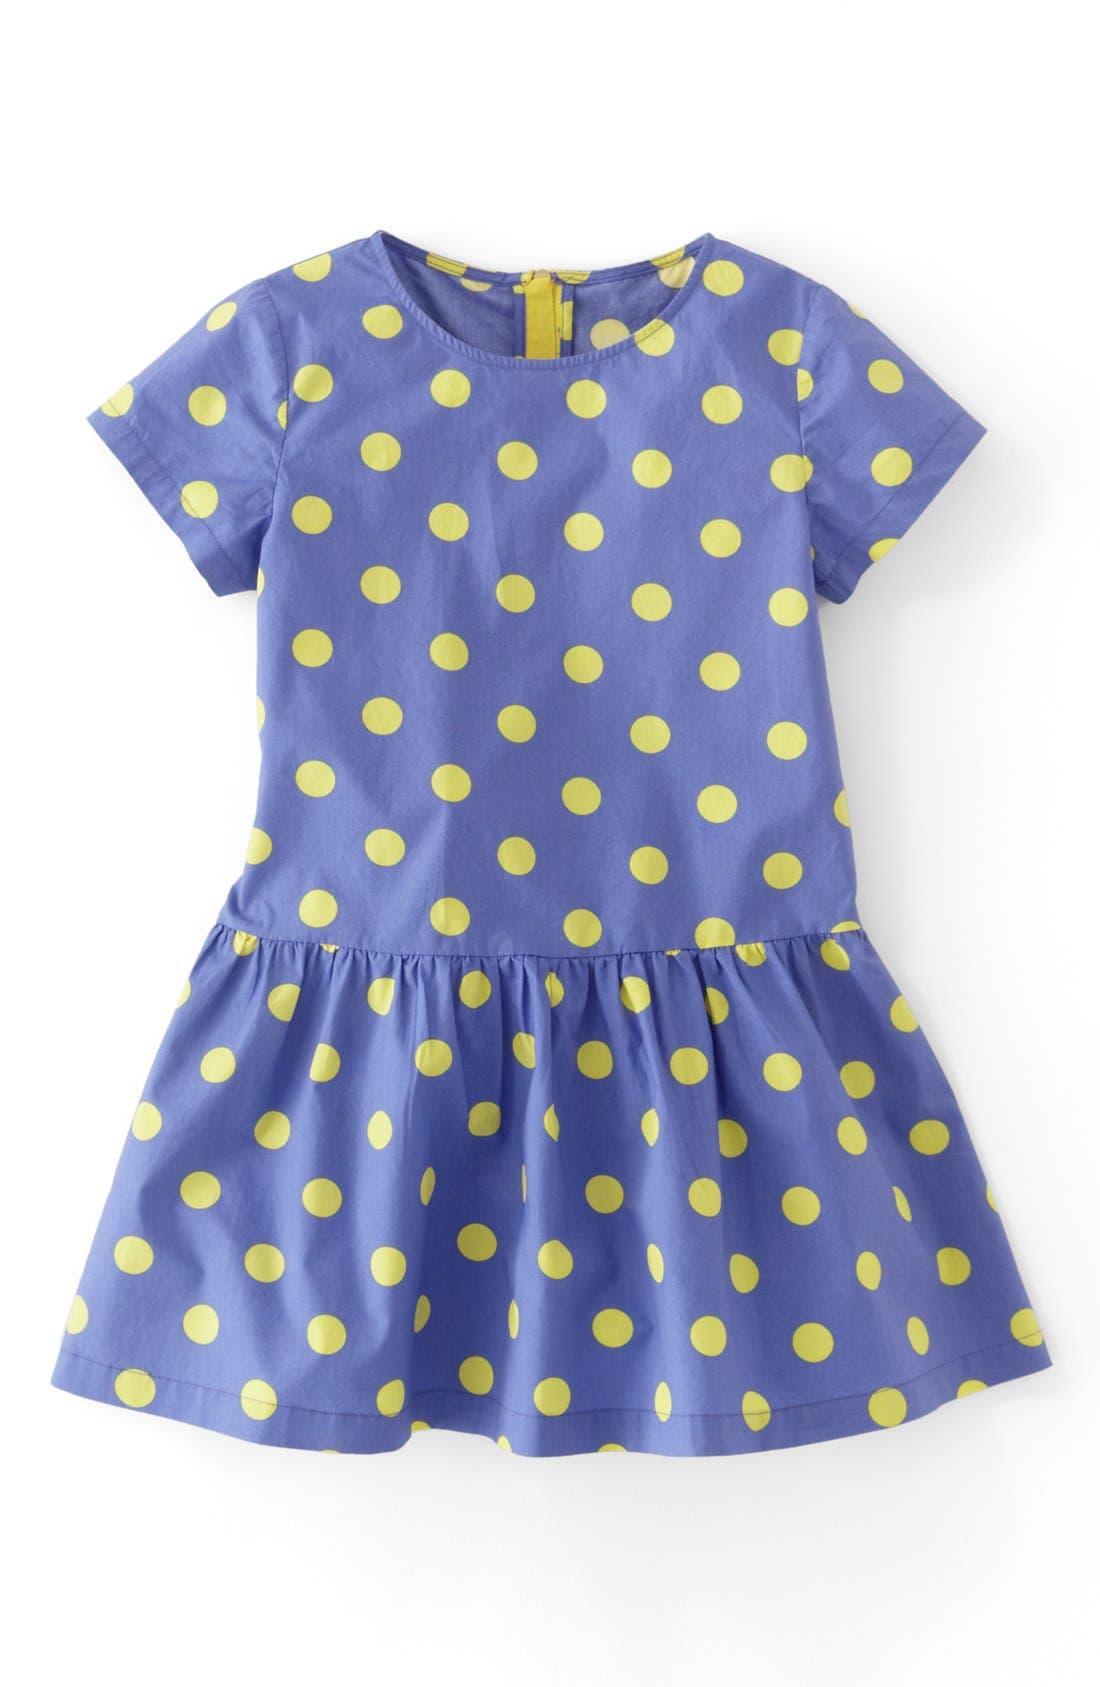 Main Image - Mini Boden 'Spotty' Dress (Little Girls & Big Girls)